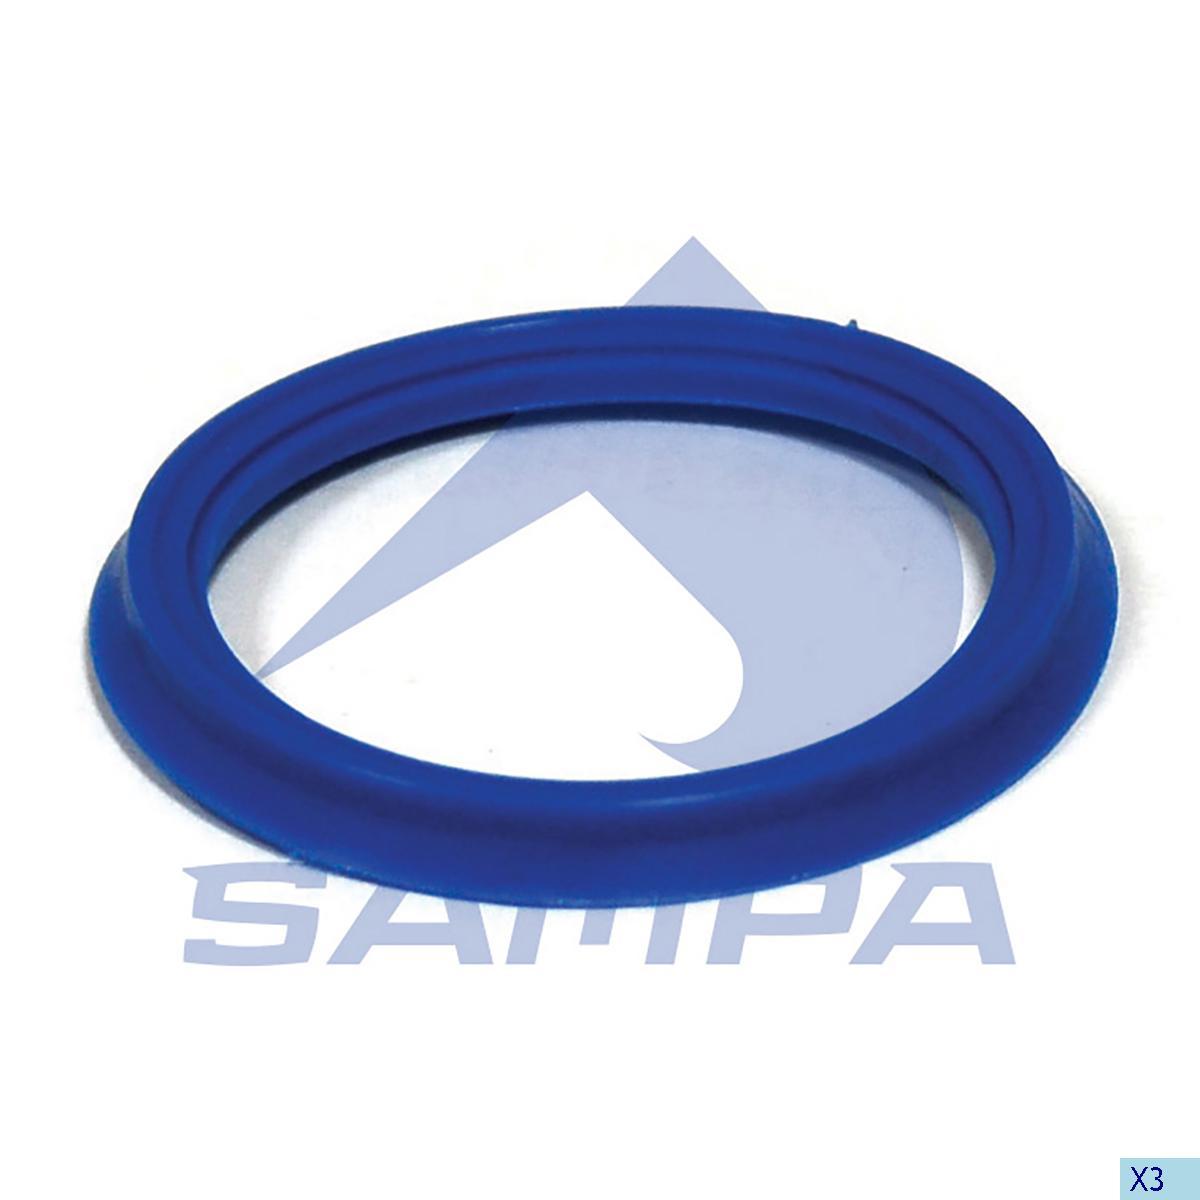 Seal Ring, Cab, Daf, Cab